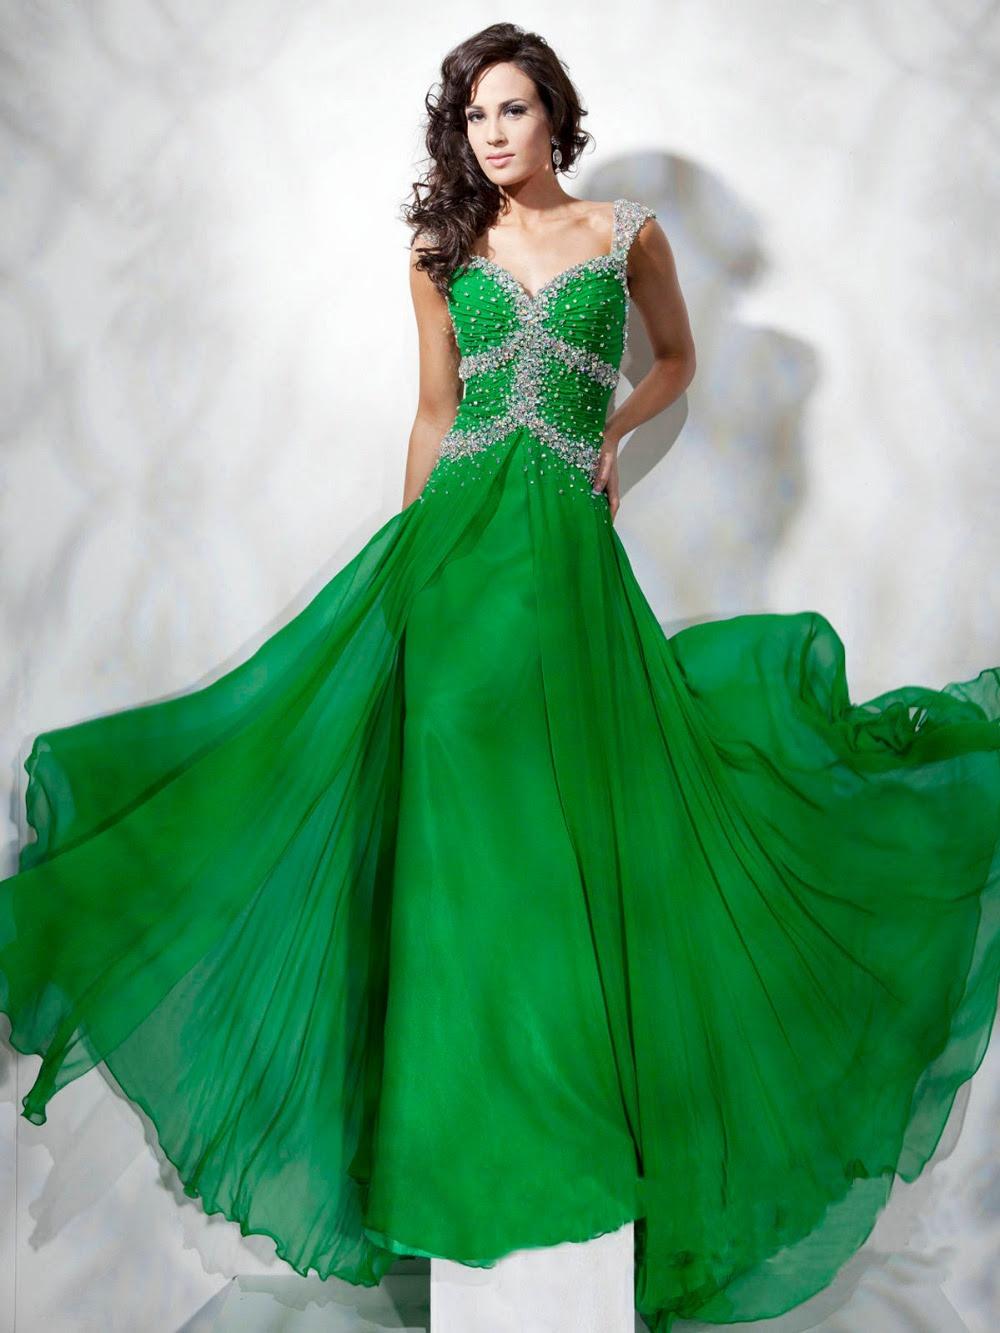 Green designer evening dresses